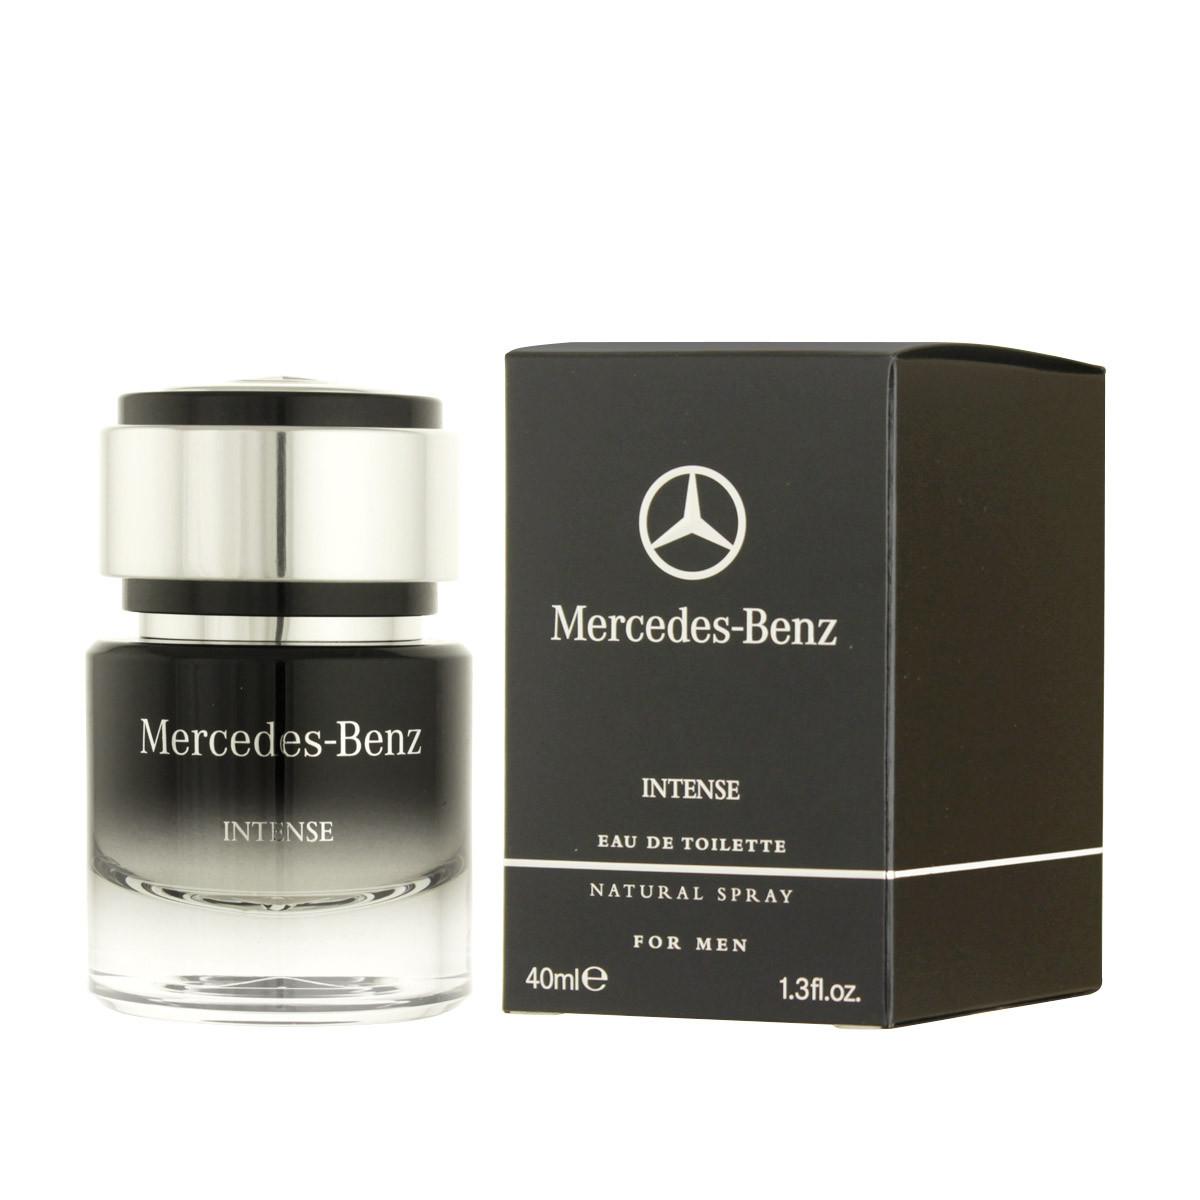 Mercedes benz intense eau de toilette 40 ml man for Mercedes benz intense